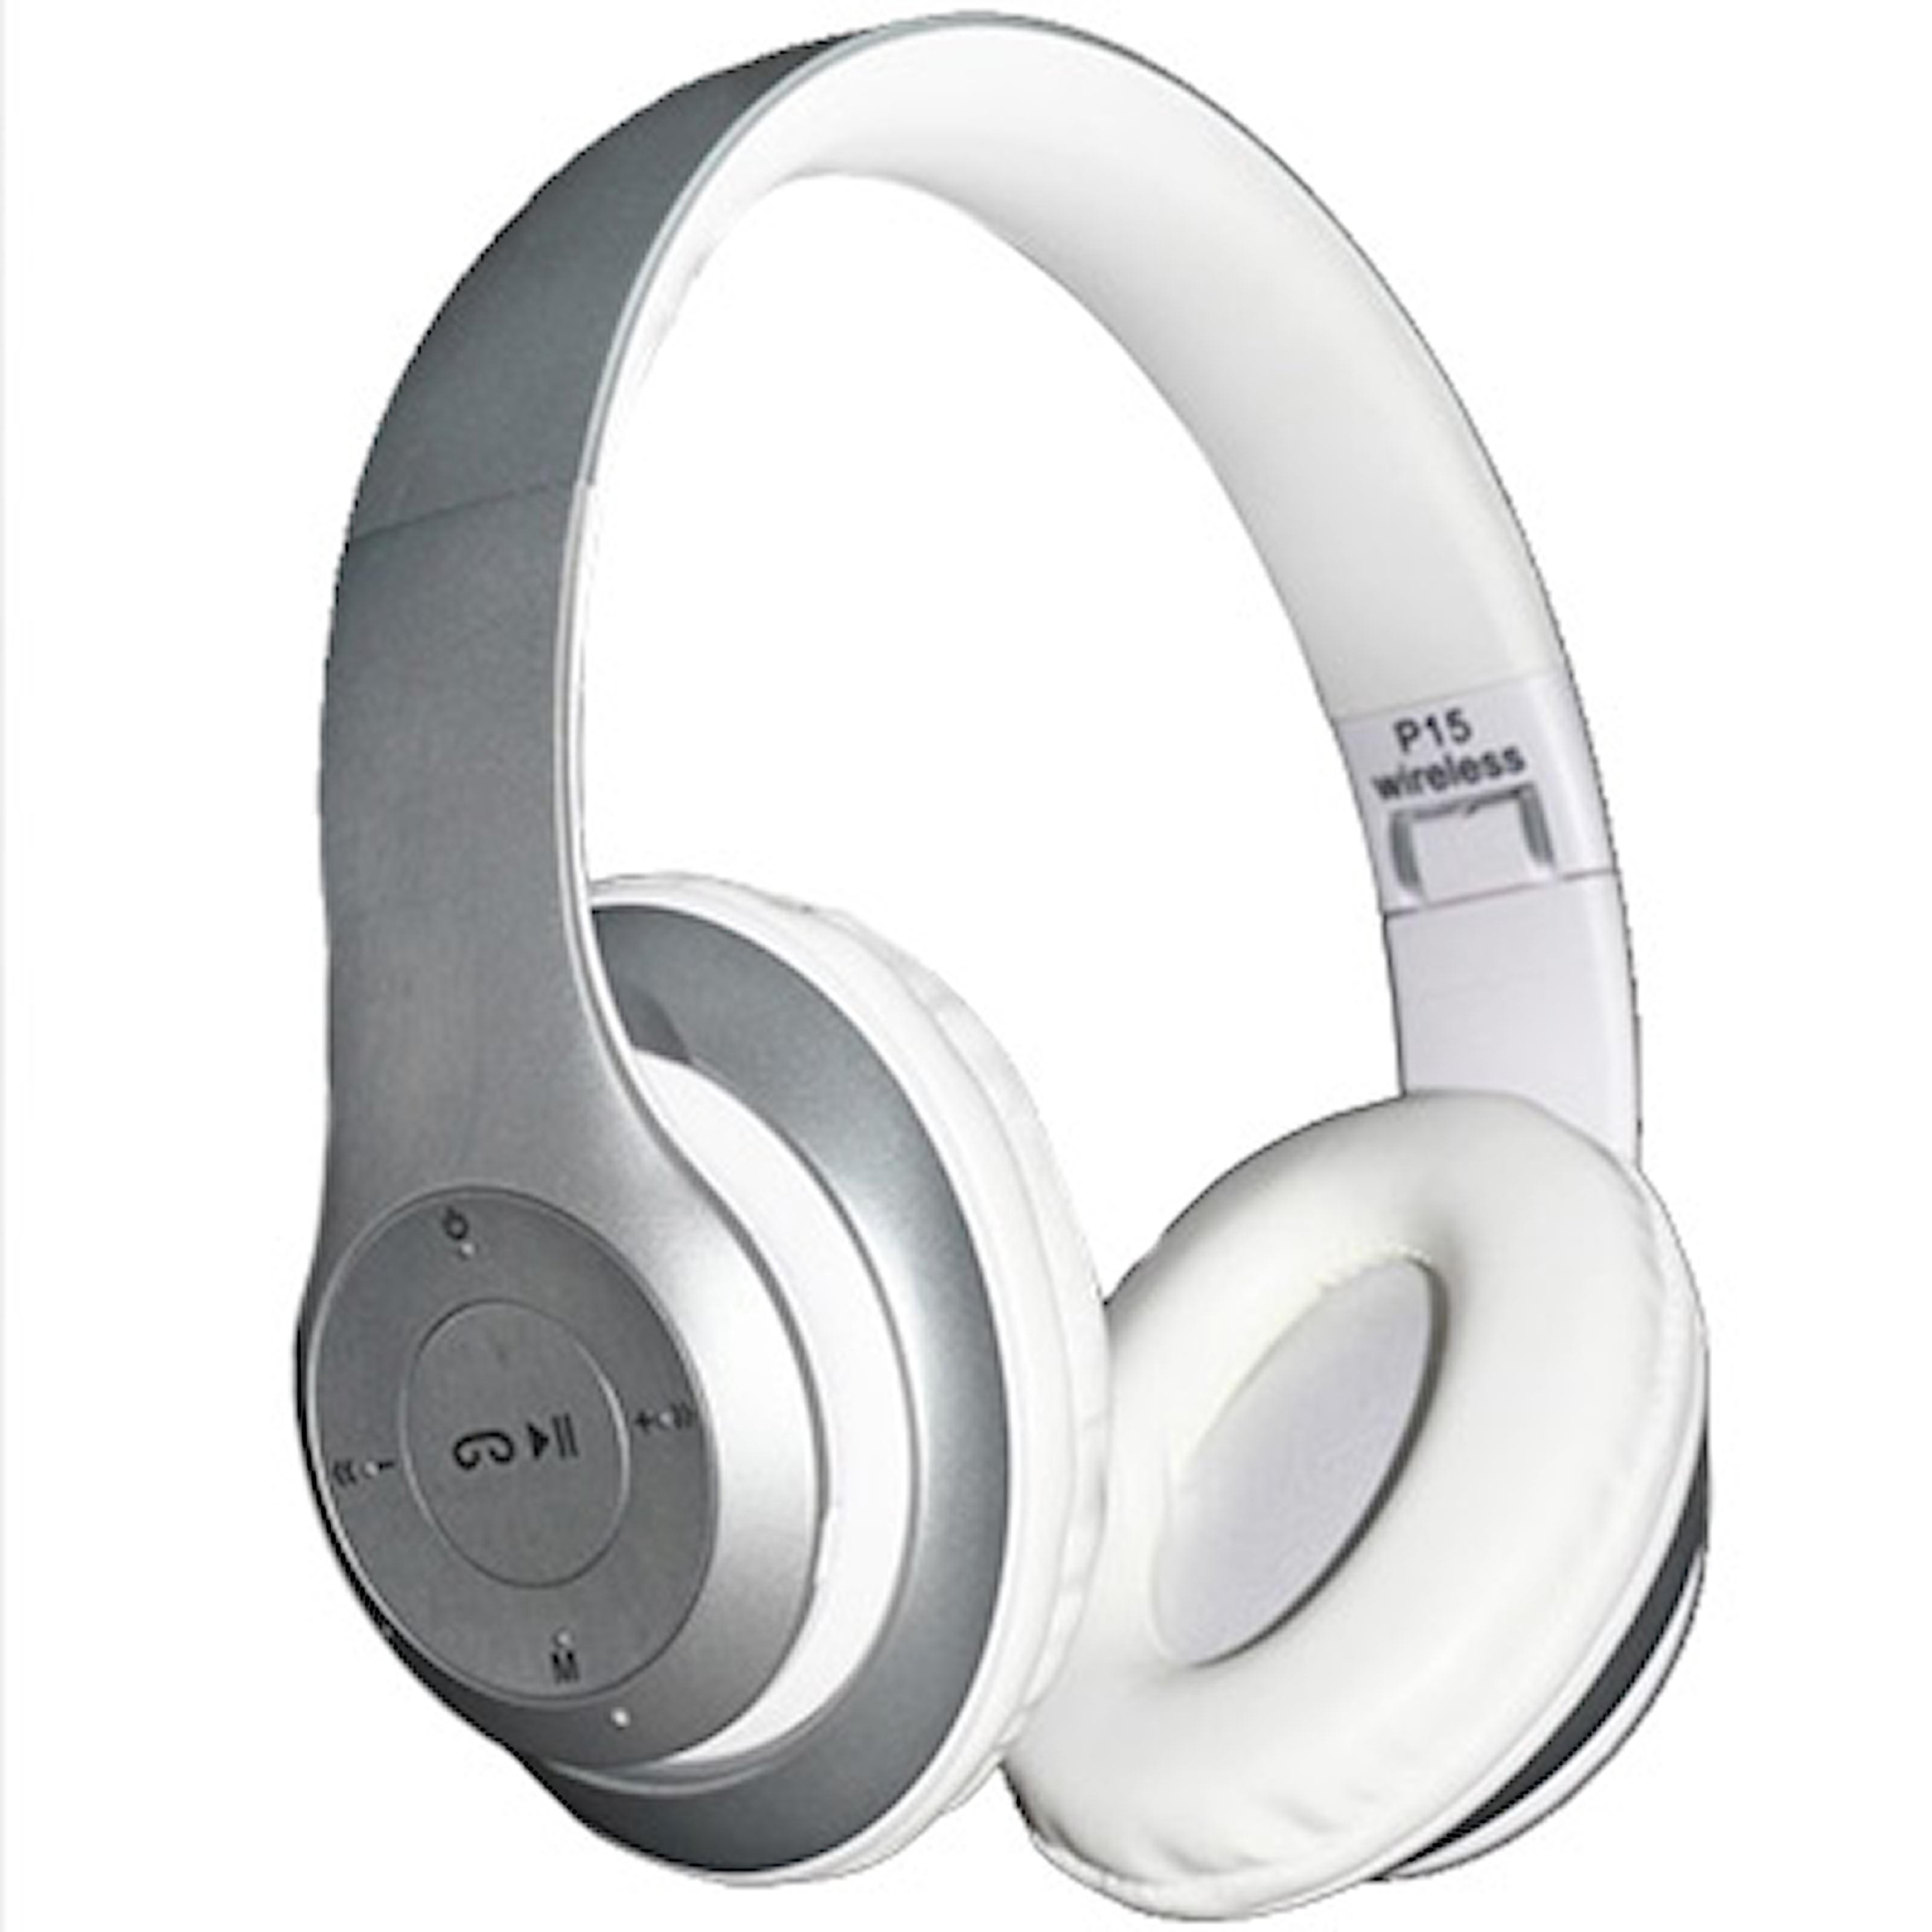 Vit, P15 Wireless Bluetooth Headset, P15 Trådlöst Headset, ,